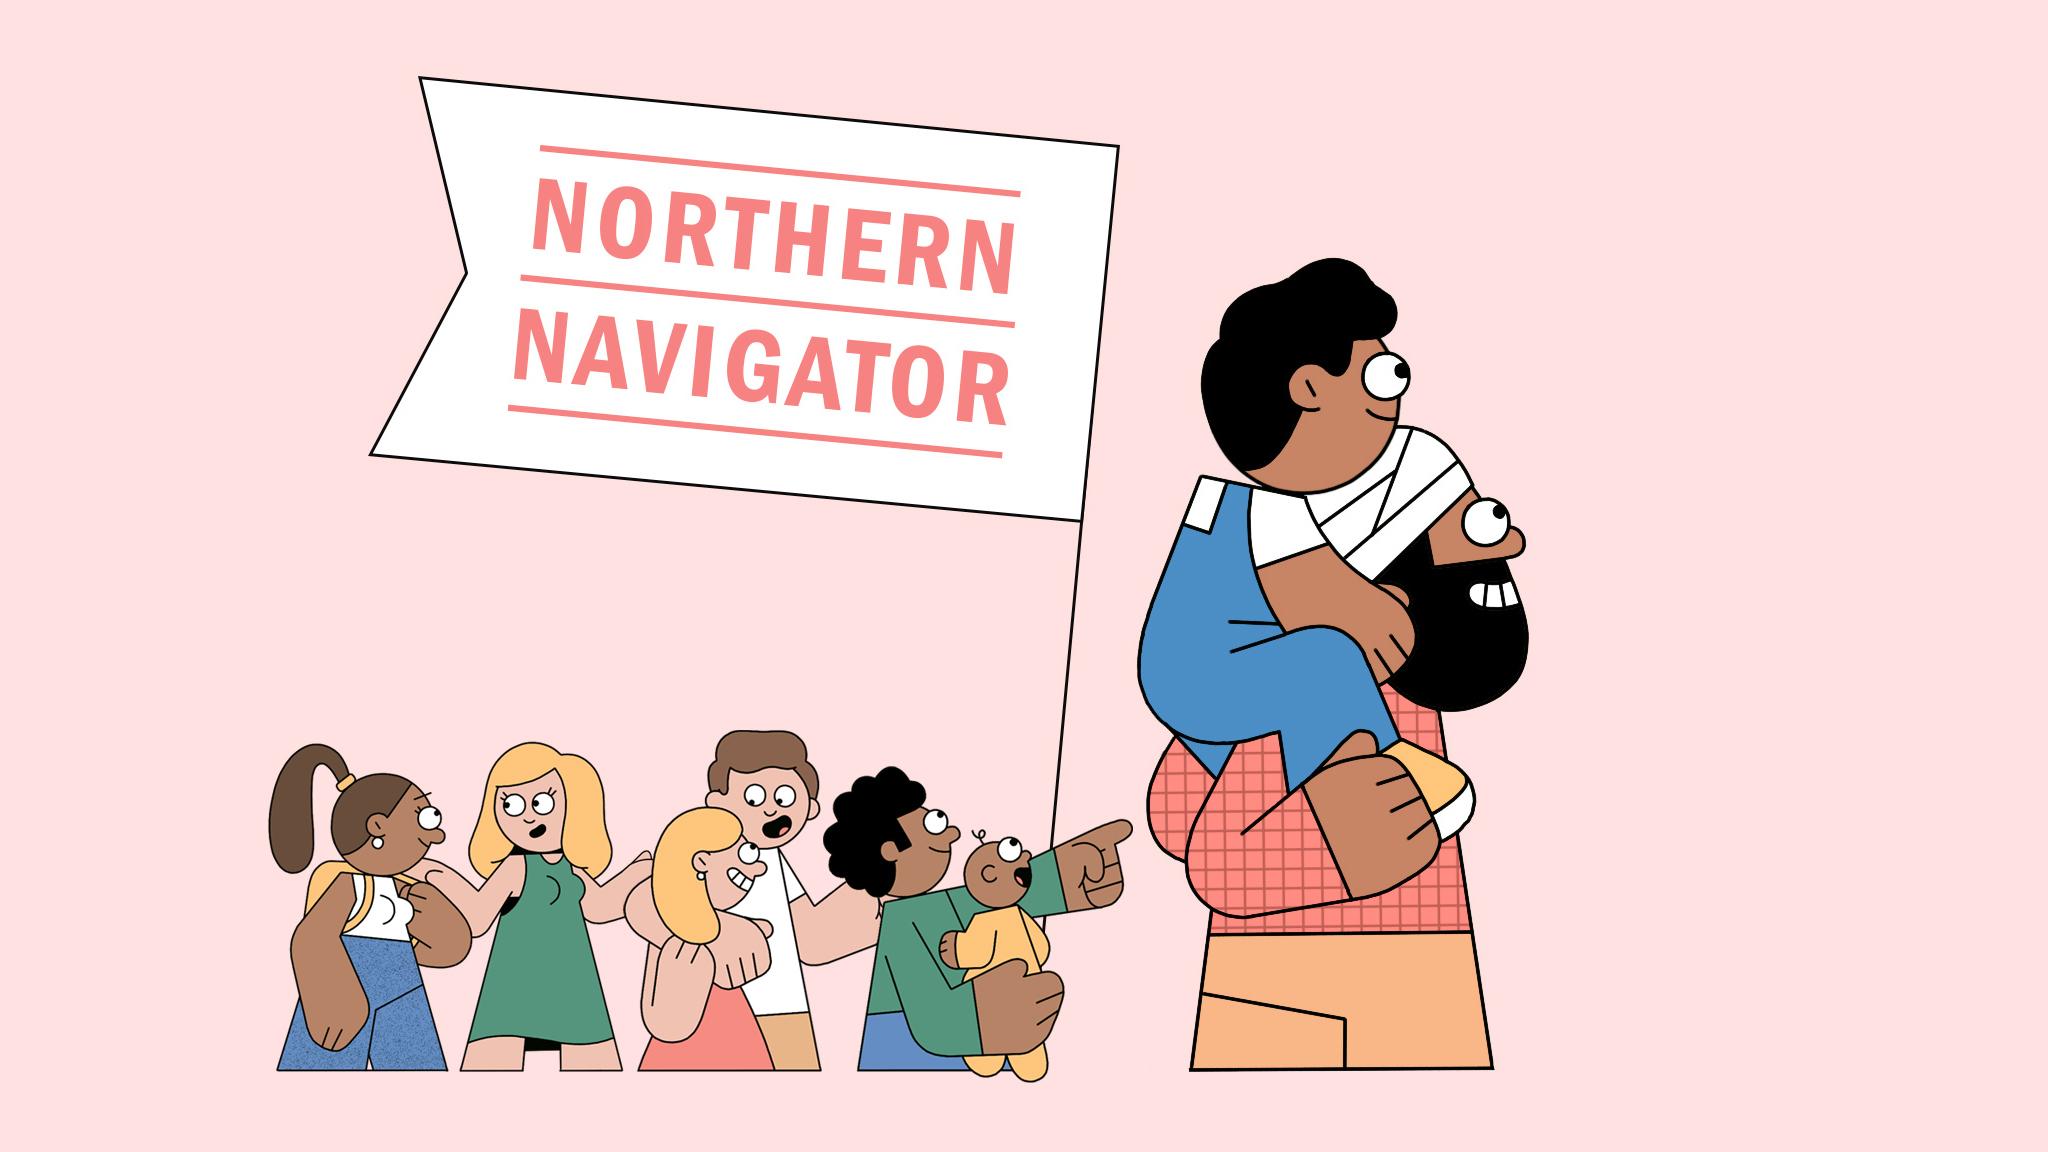 Northern Navigator